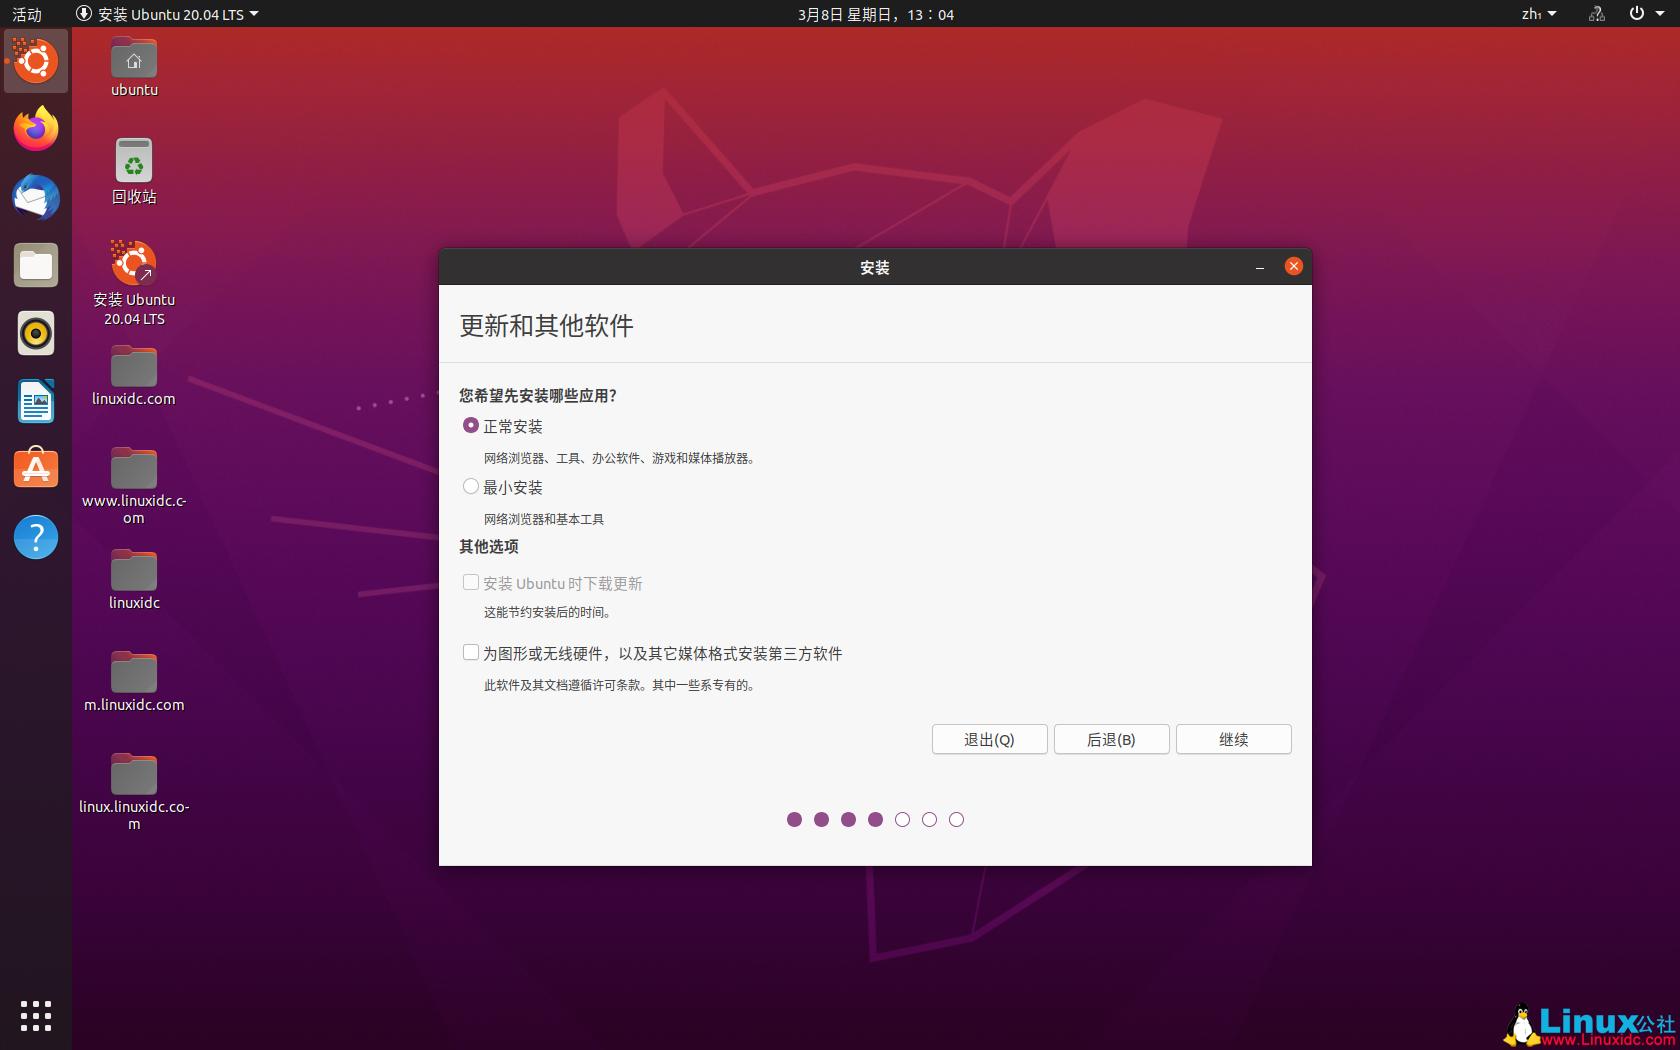 VMWare虚拟机安装Ubuntu 20.04 LTS 图解